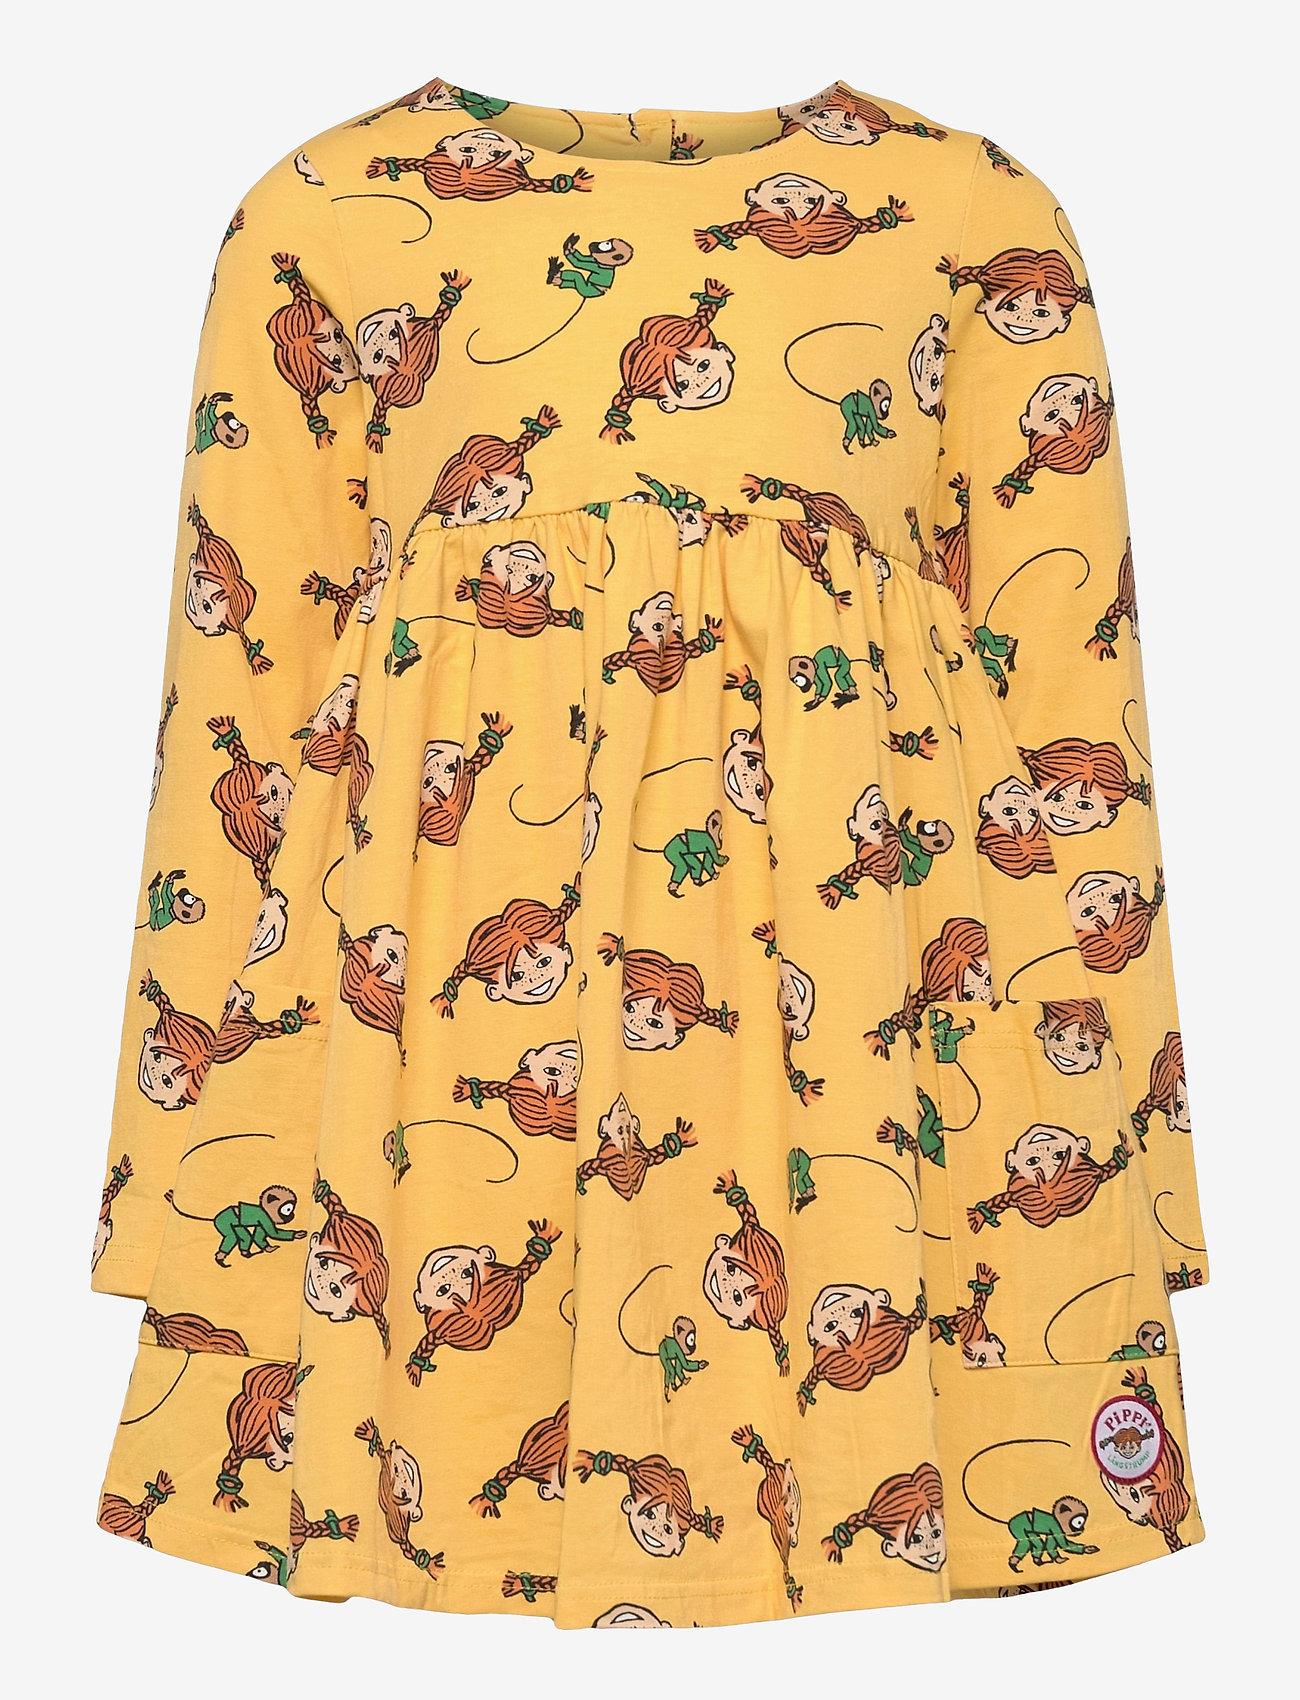 Martinex - PLAITS DRESS - kleider - yellow - 0